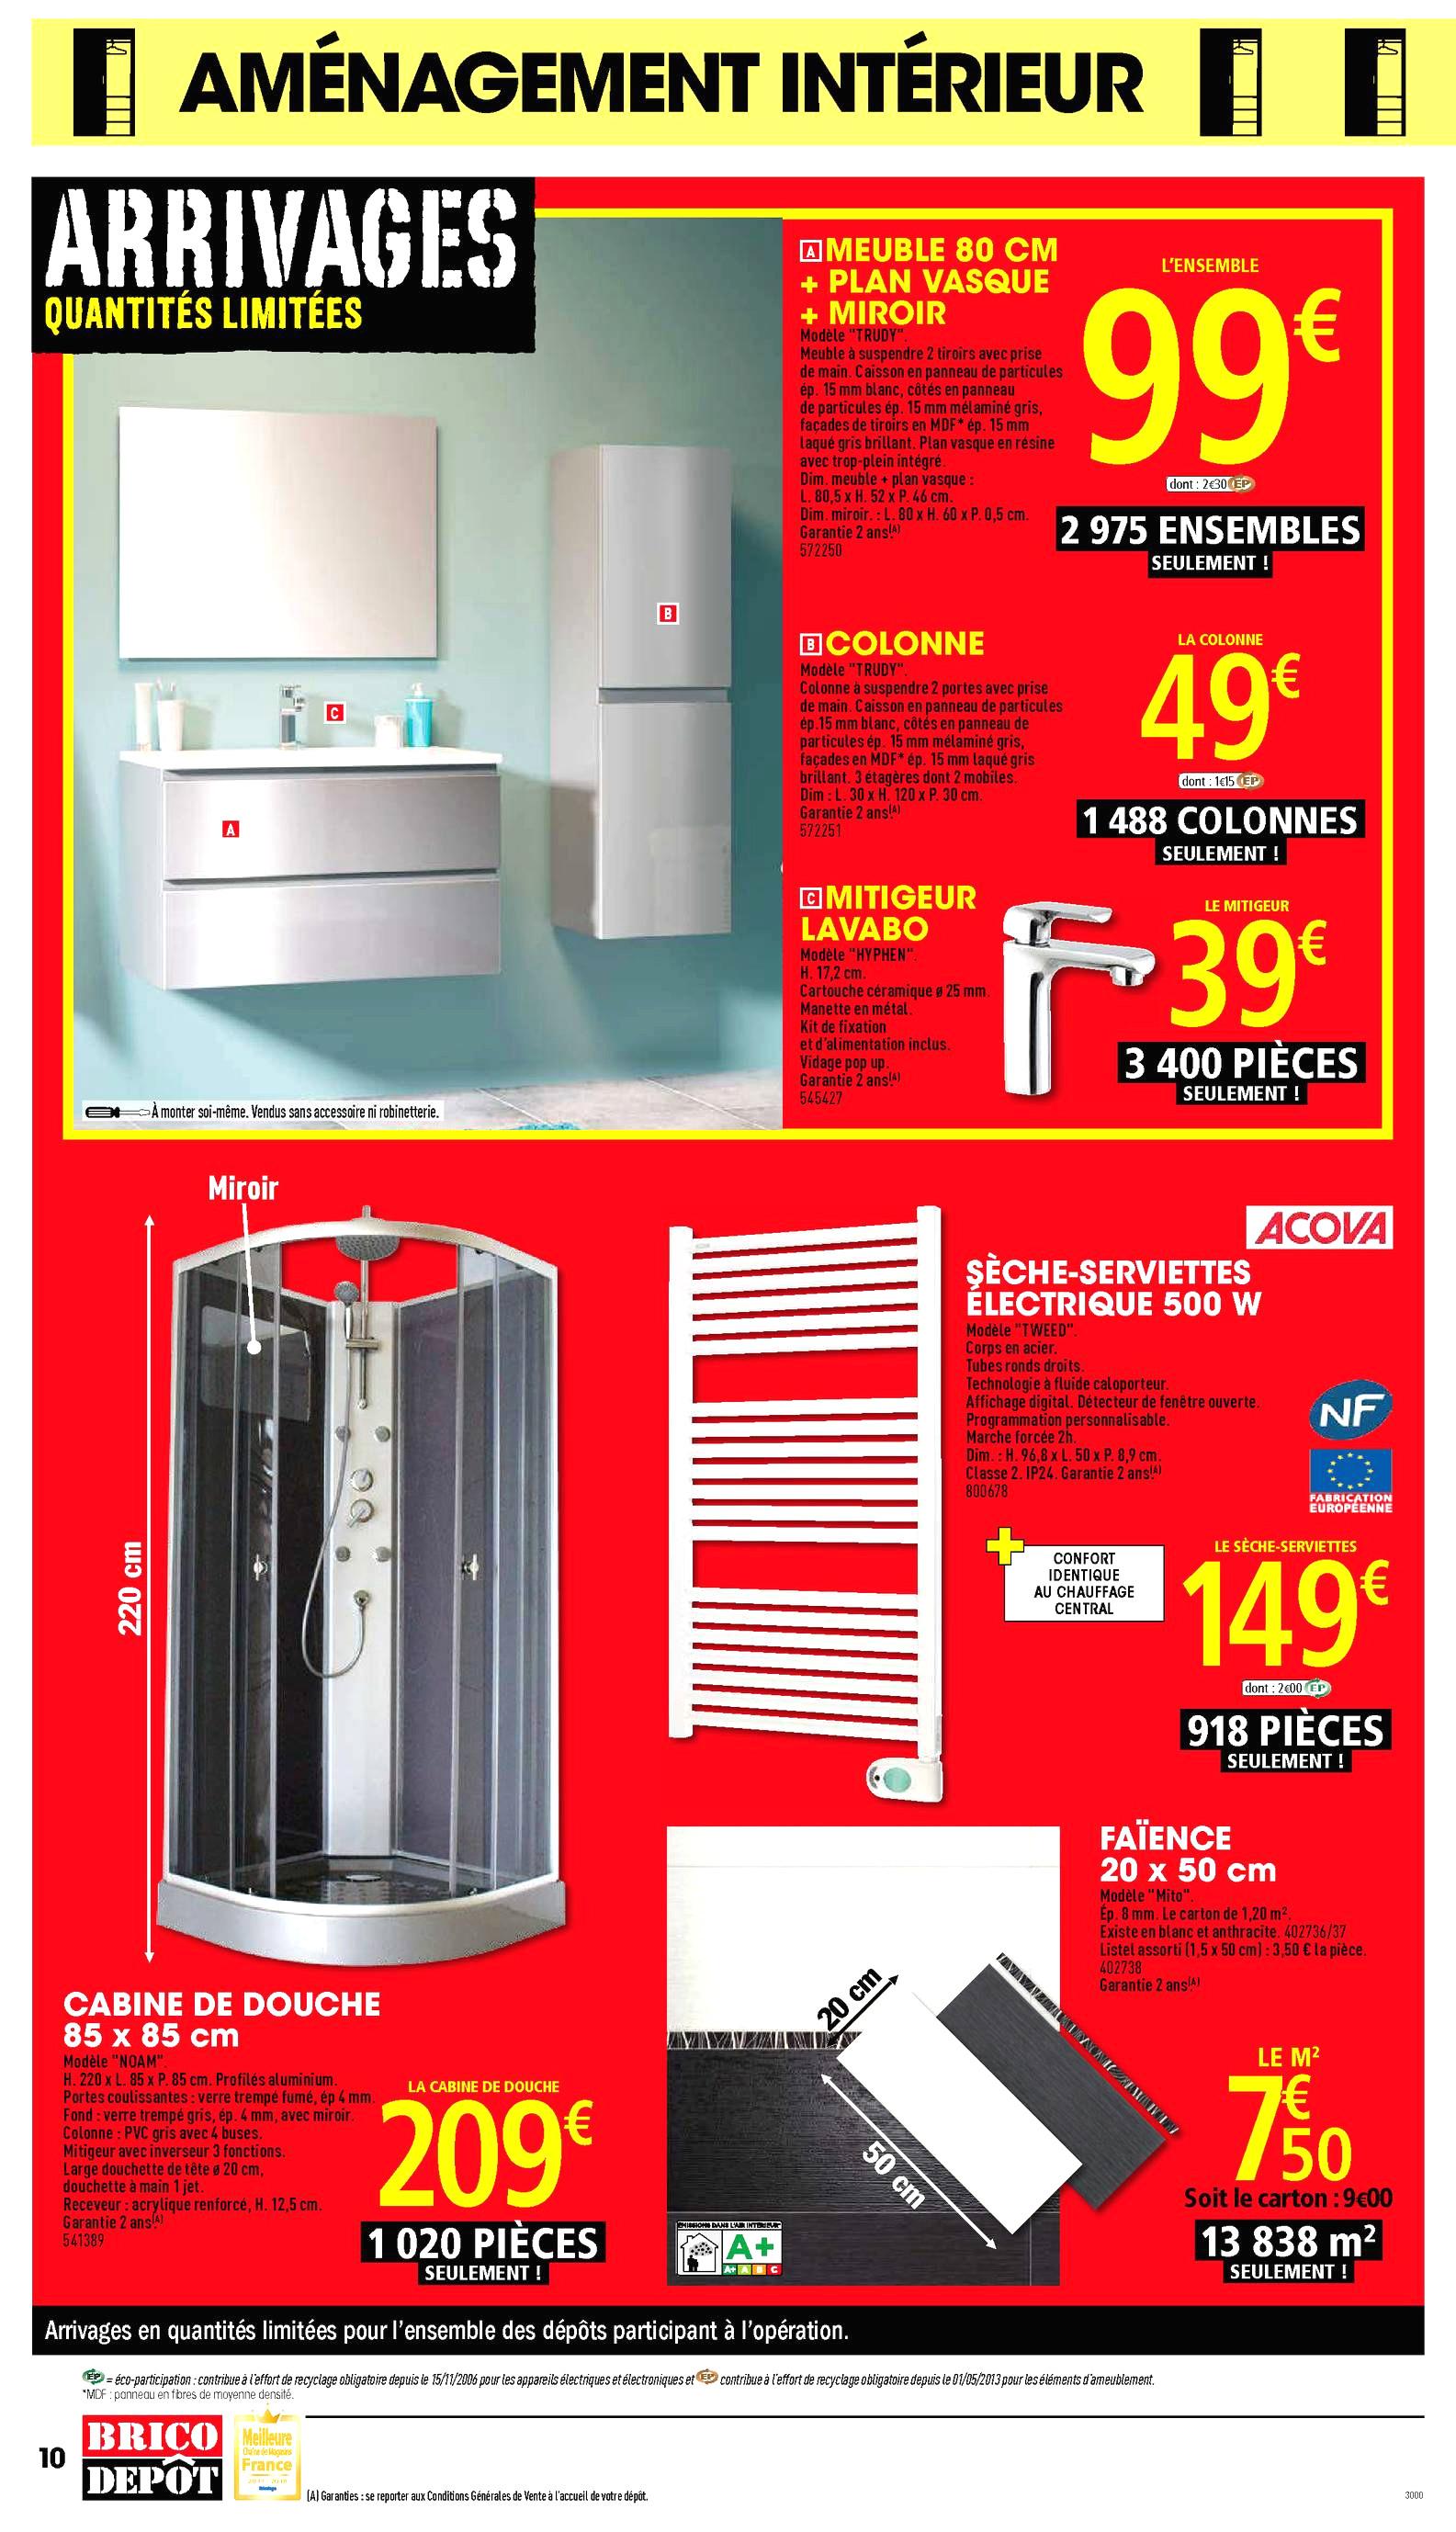 Malette Outils Brico Depot Beau Photos Brico Depot Dissay Catalogue Interesting No Catalogs with Brico Avec